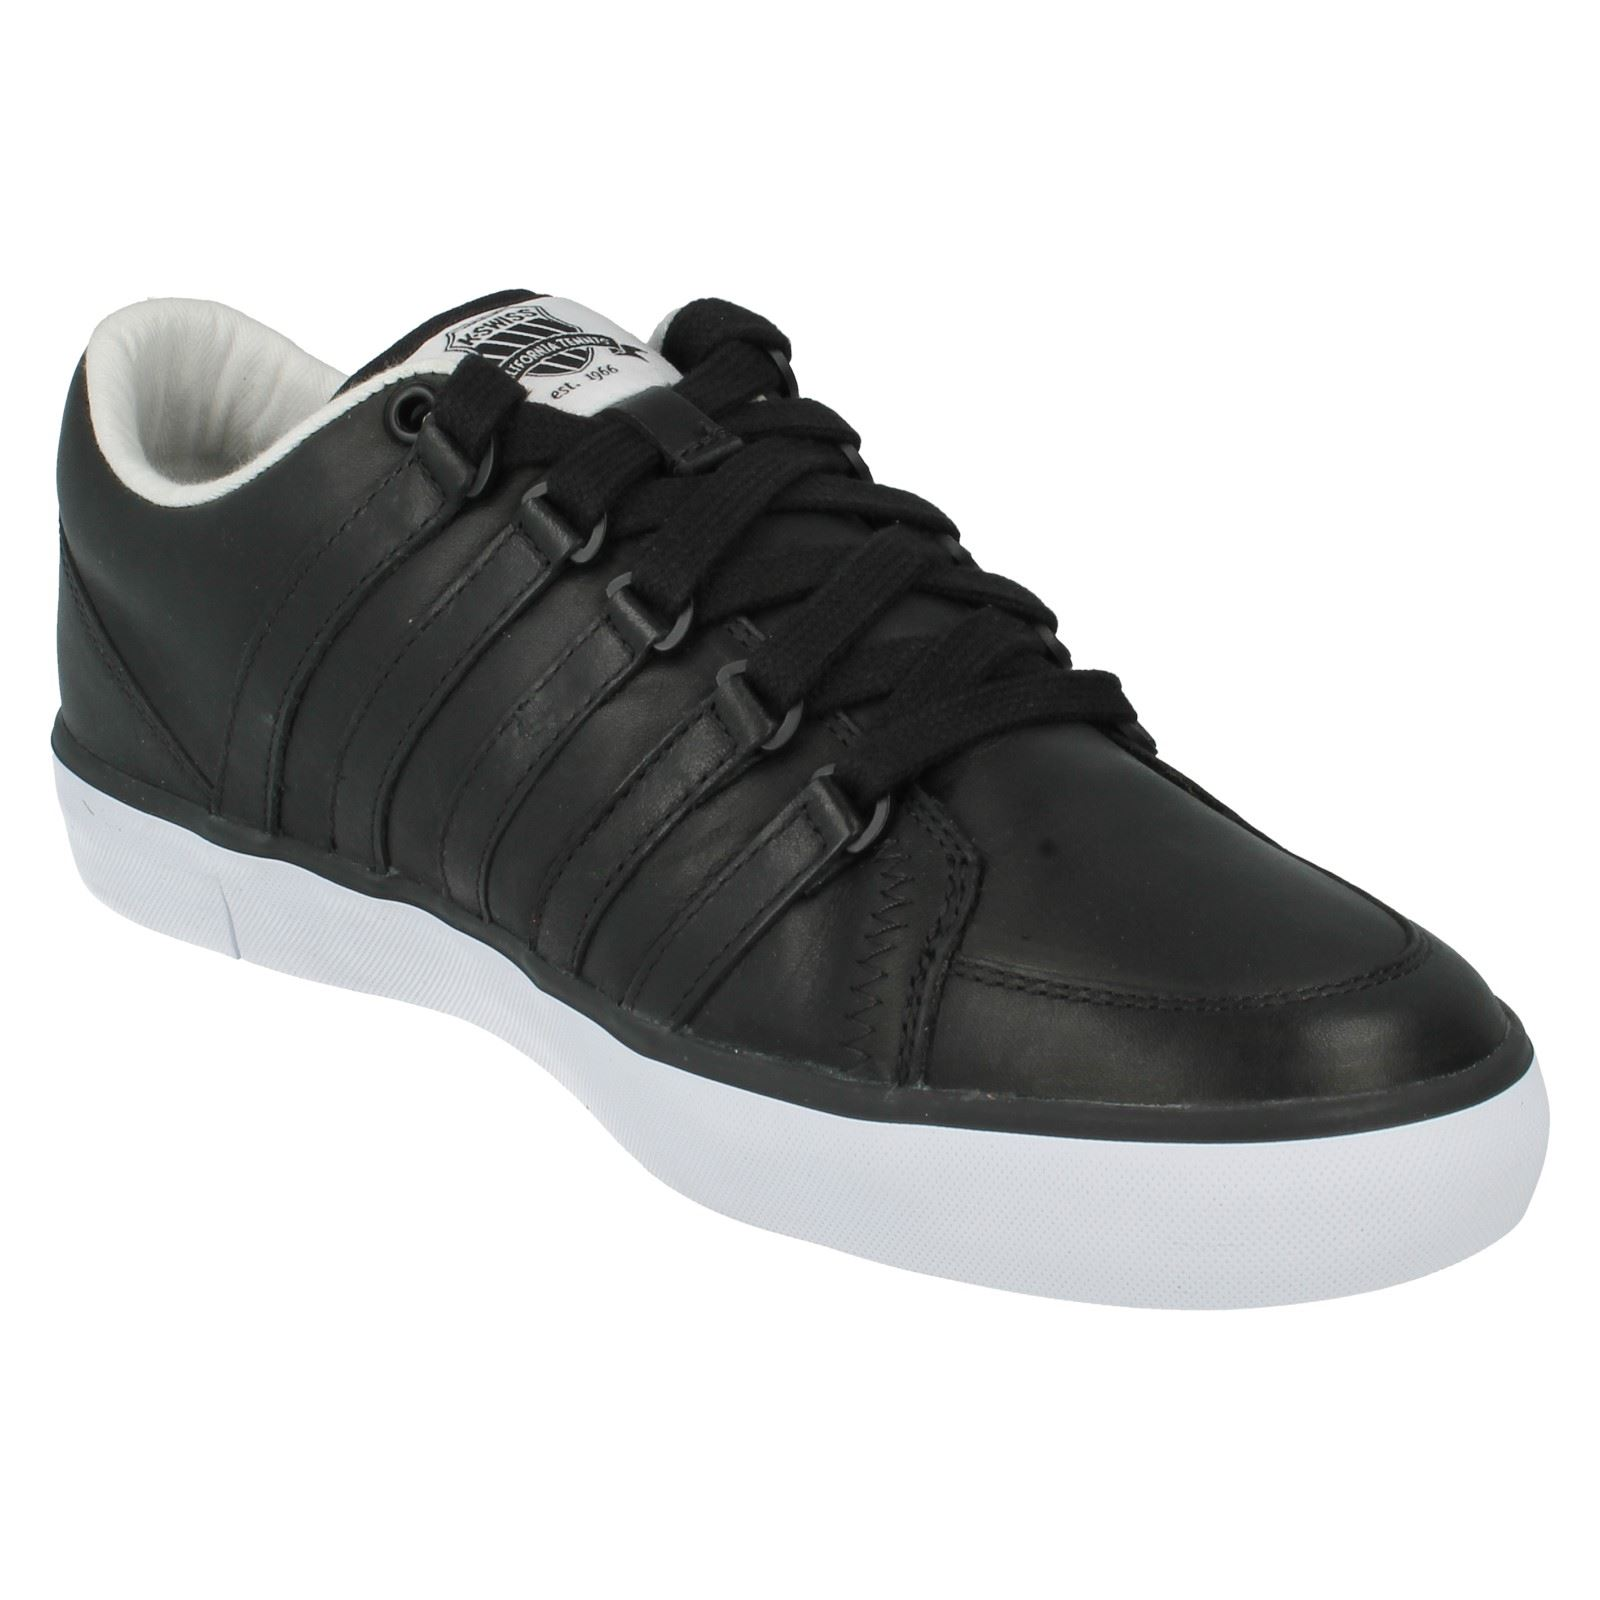 E K Swiss Mens Shoe Sz